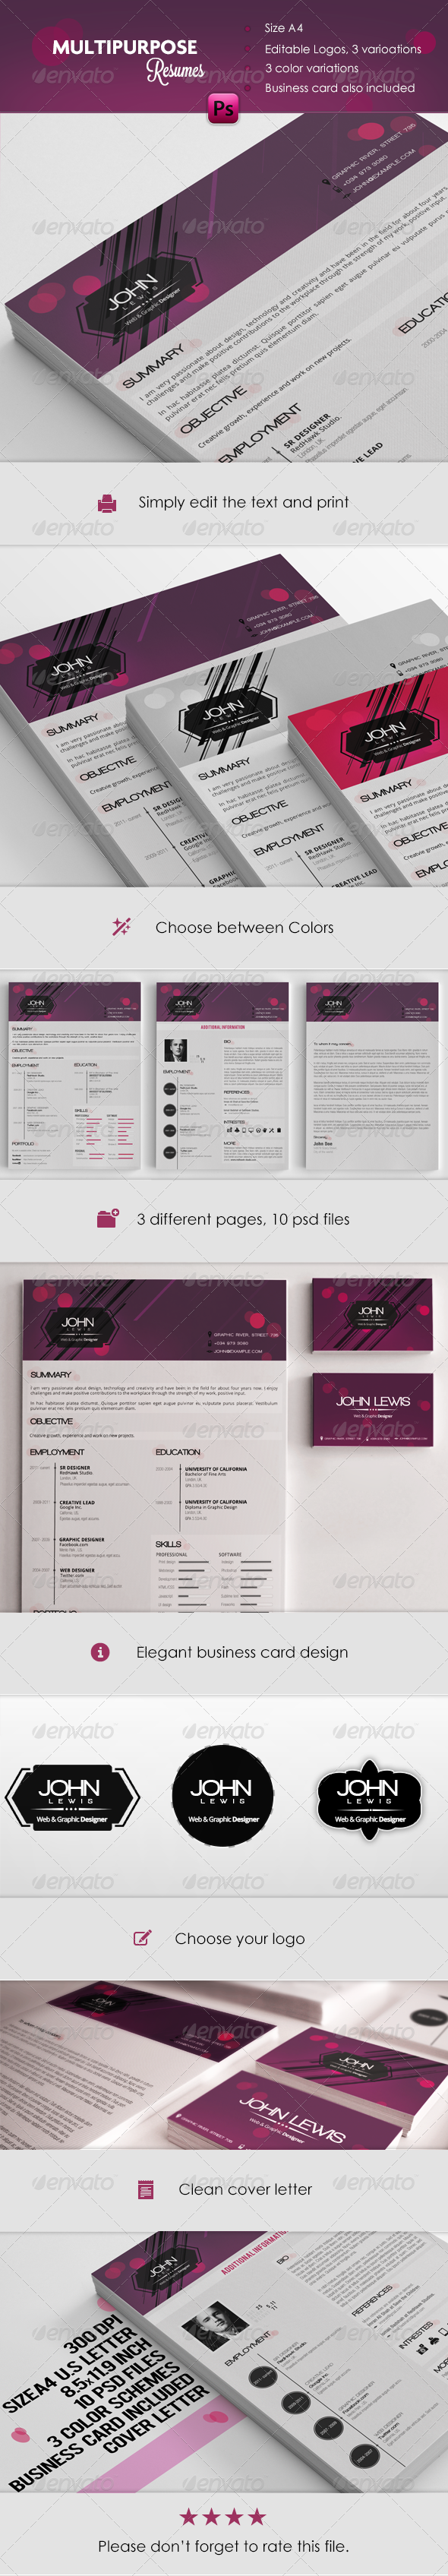 Multipurpose Resume + Cover Letters